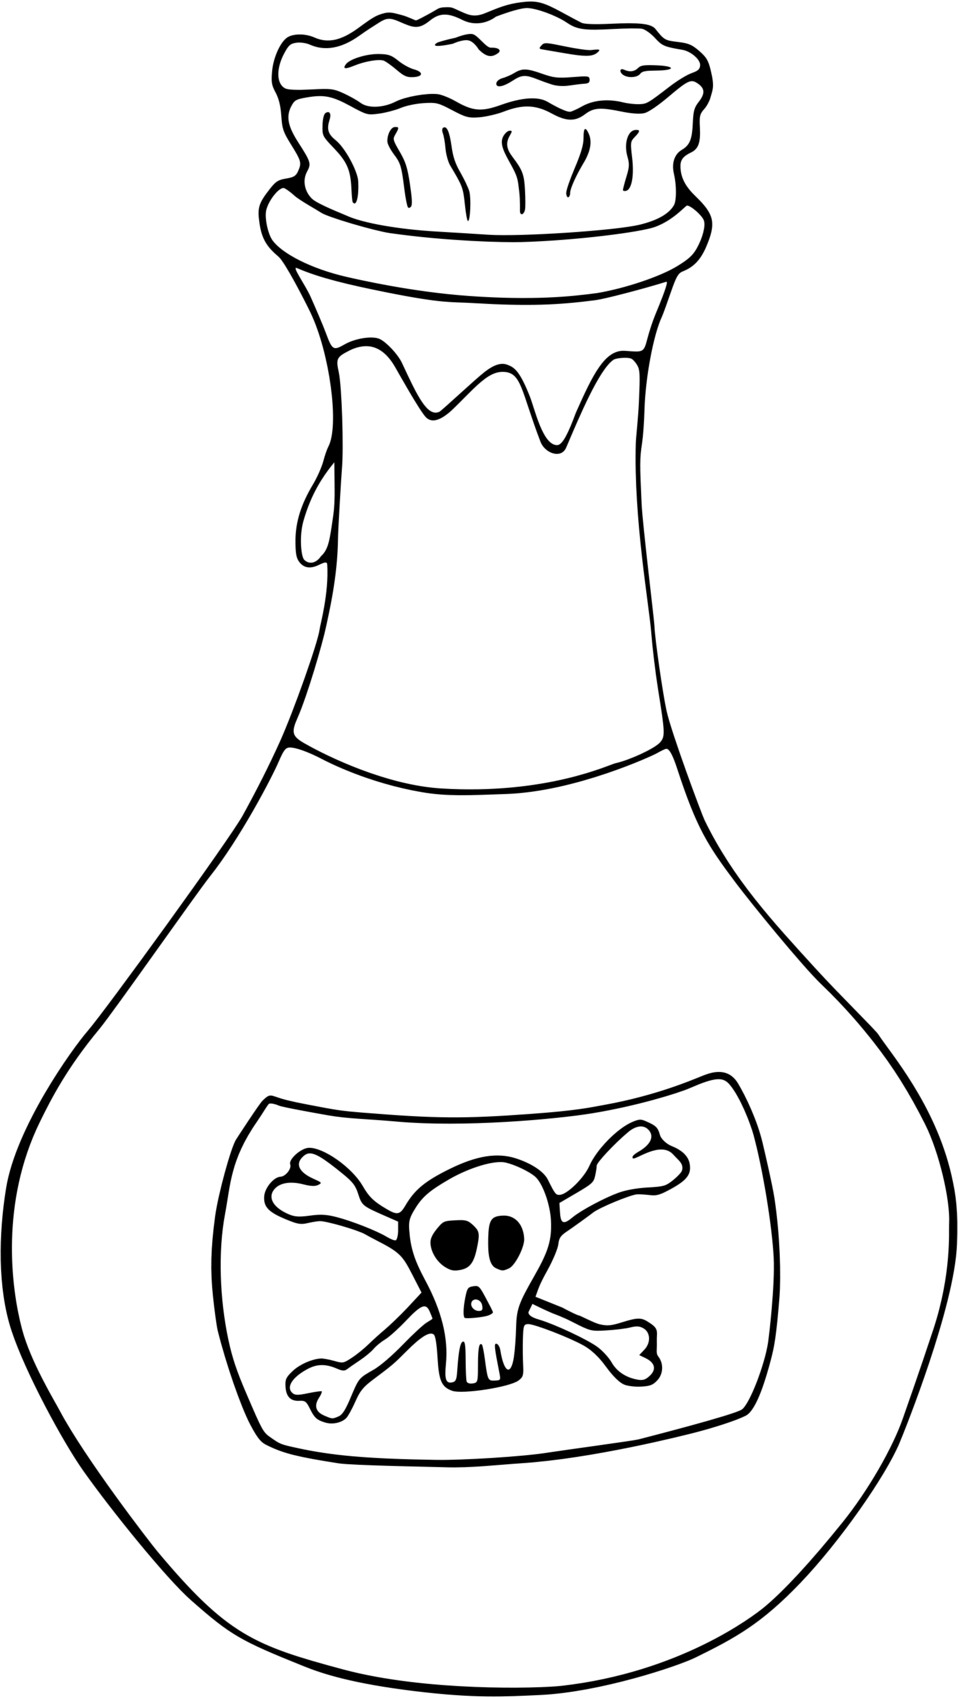 Illustration of a bottle of poison : Free Stock Photo